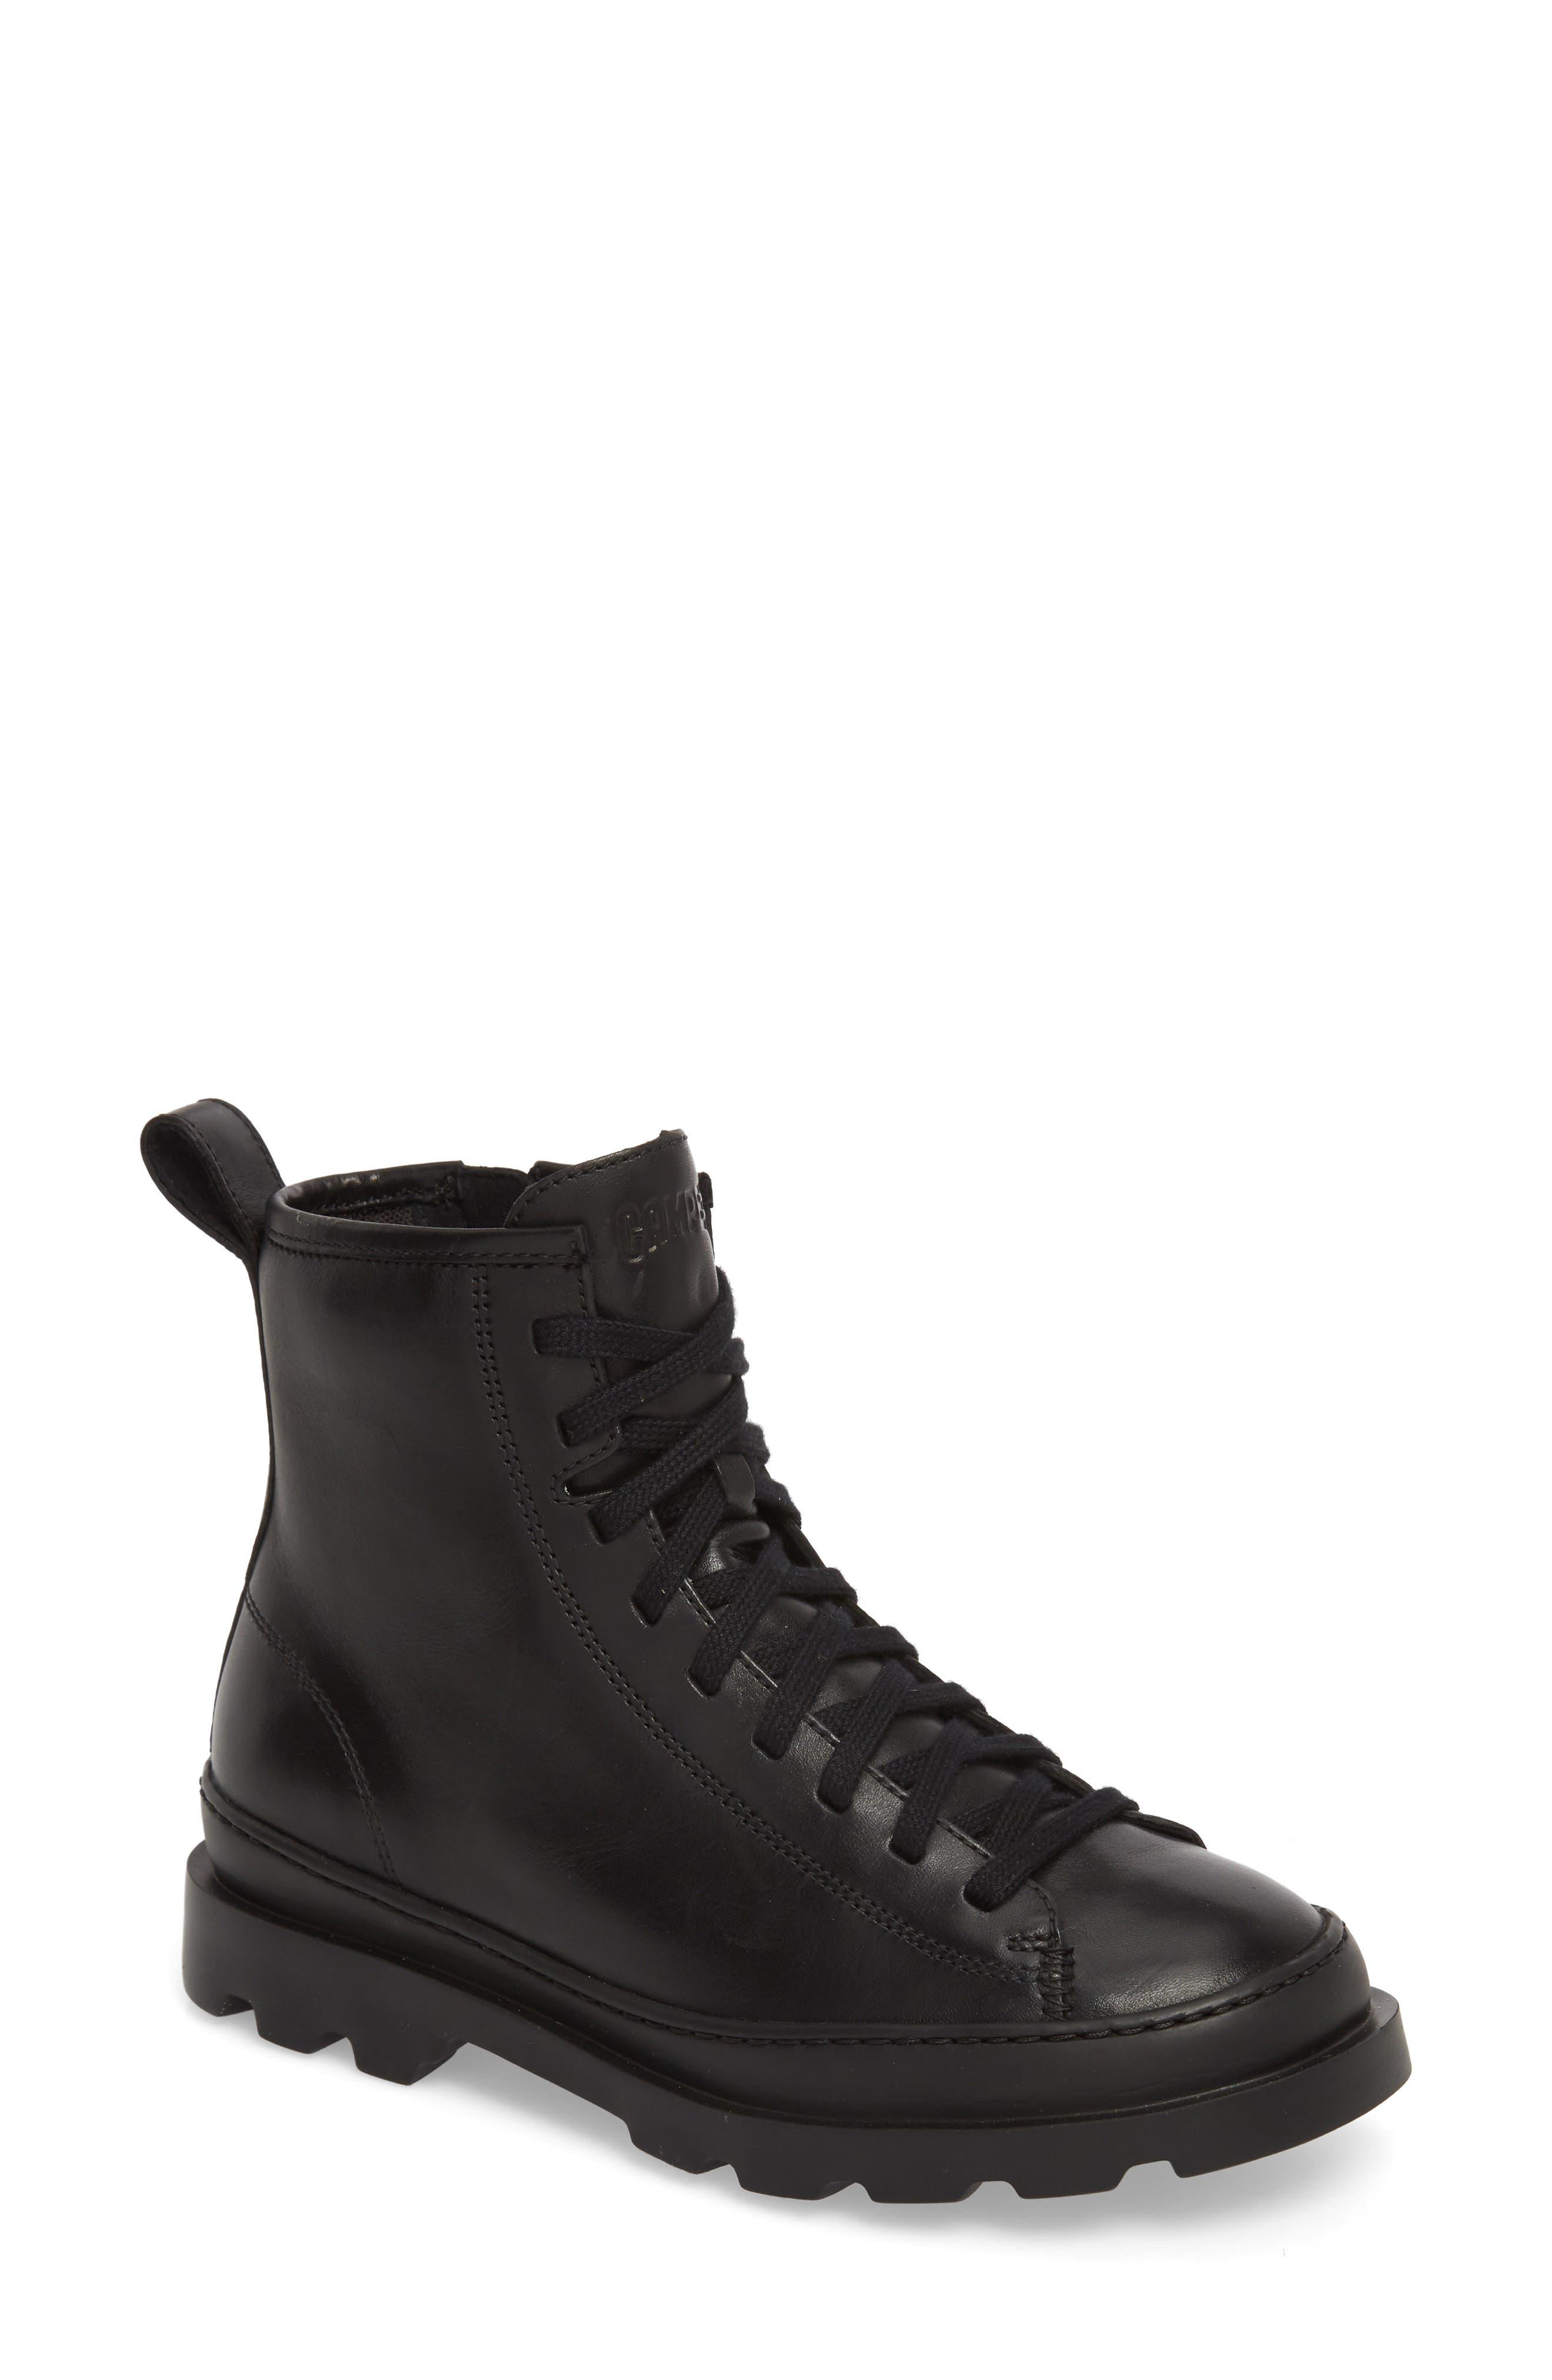 Brutus Combat Boot,                         Main,                         color, BLACK LEATHER